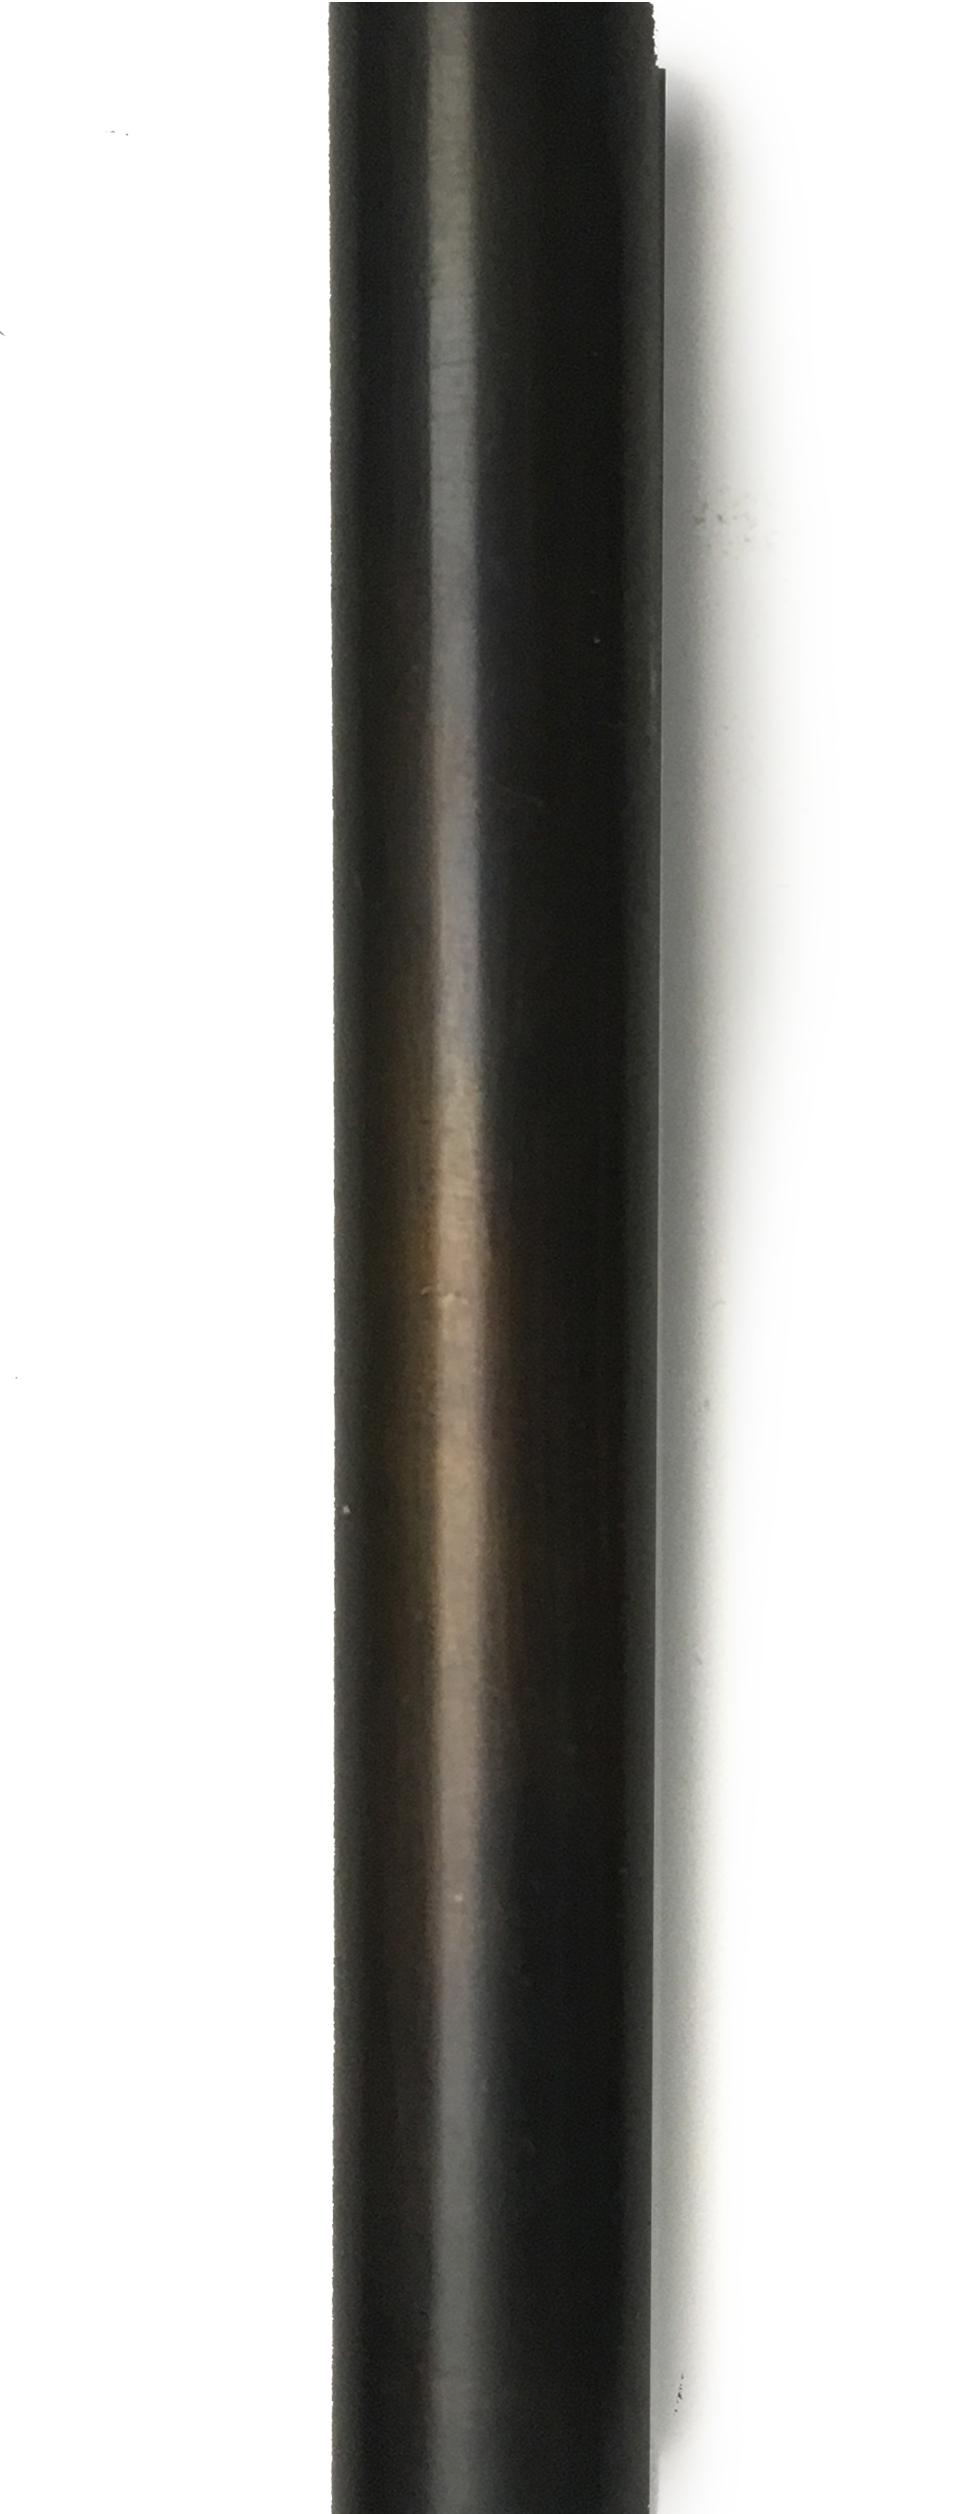 ORB-3